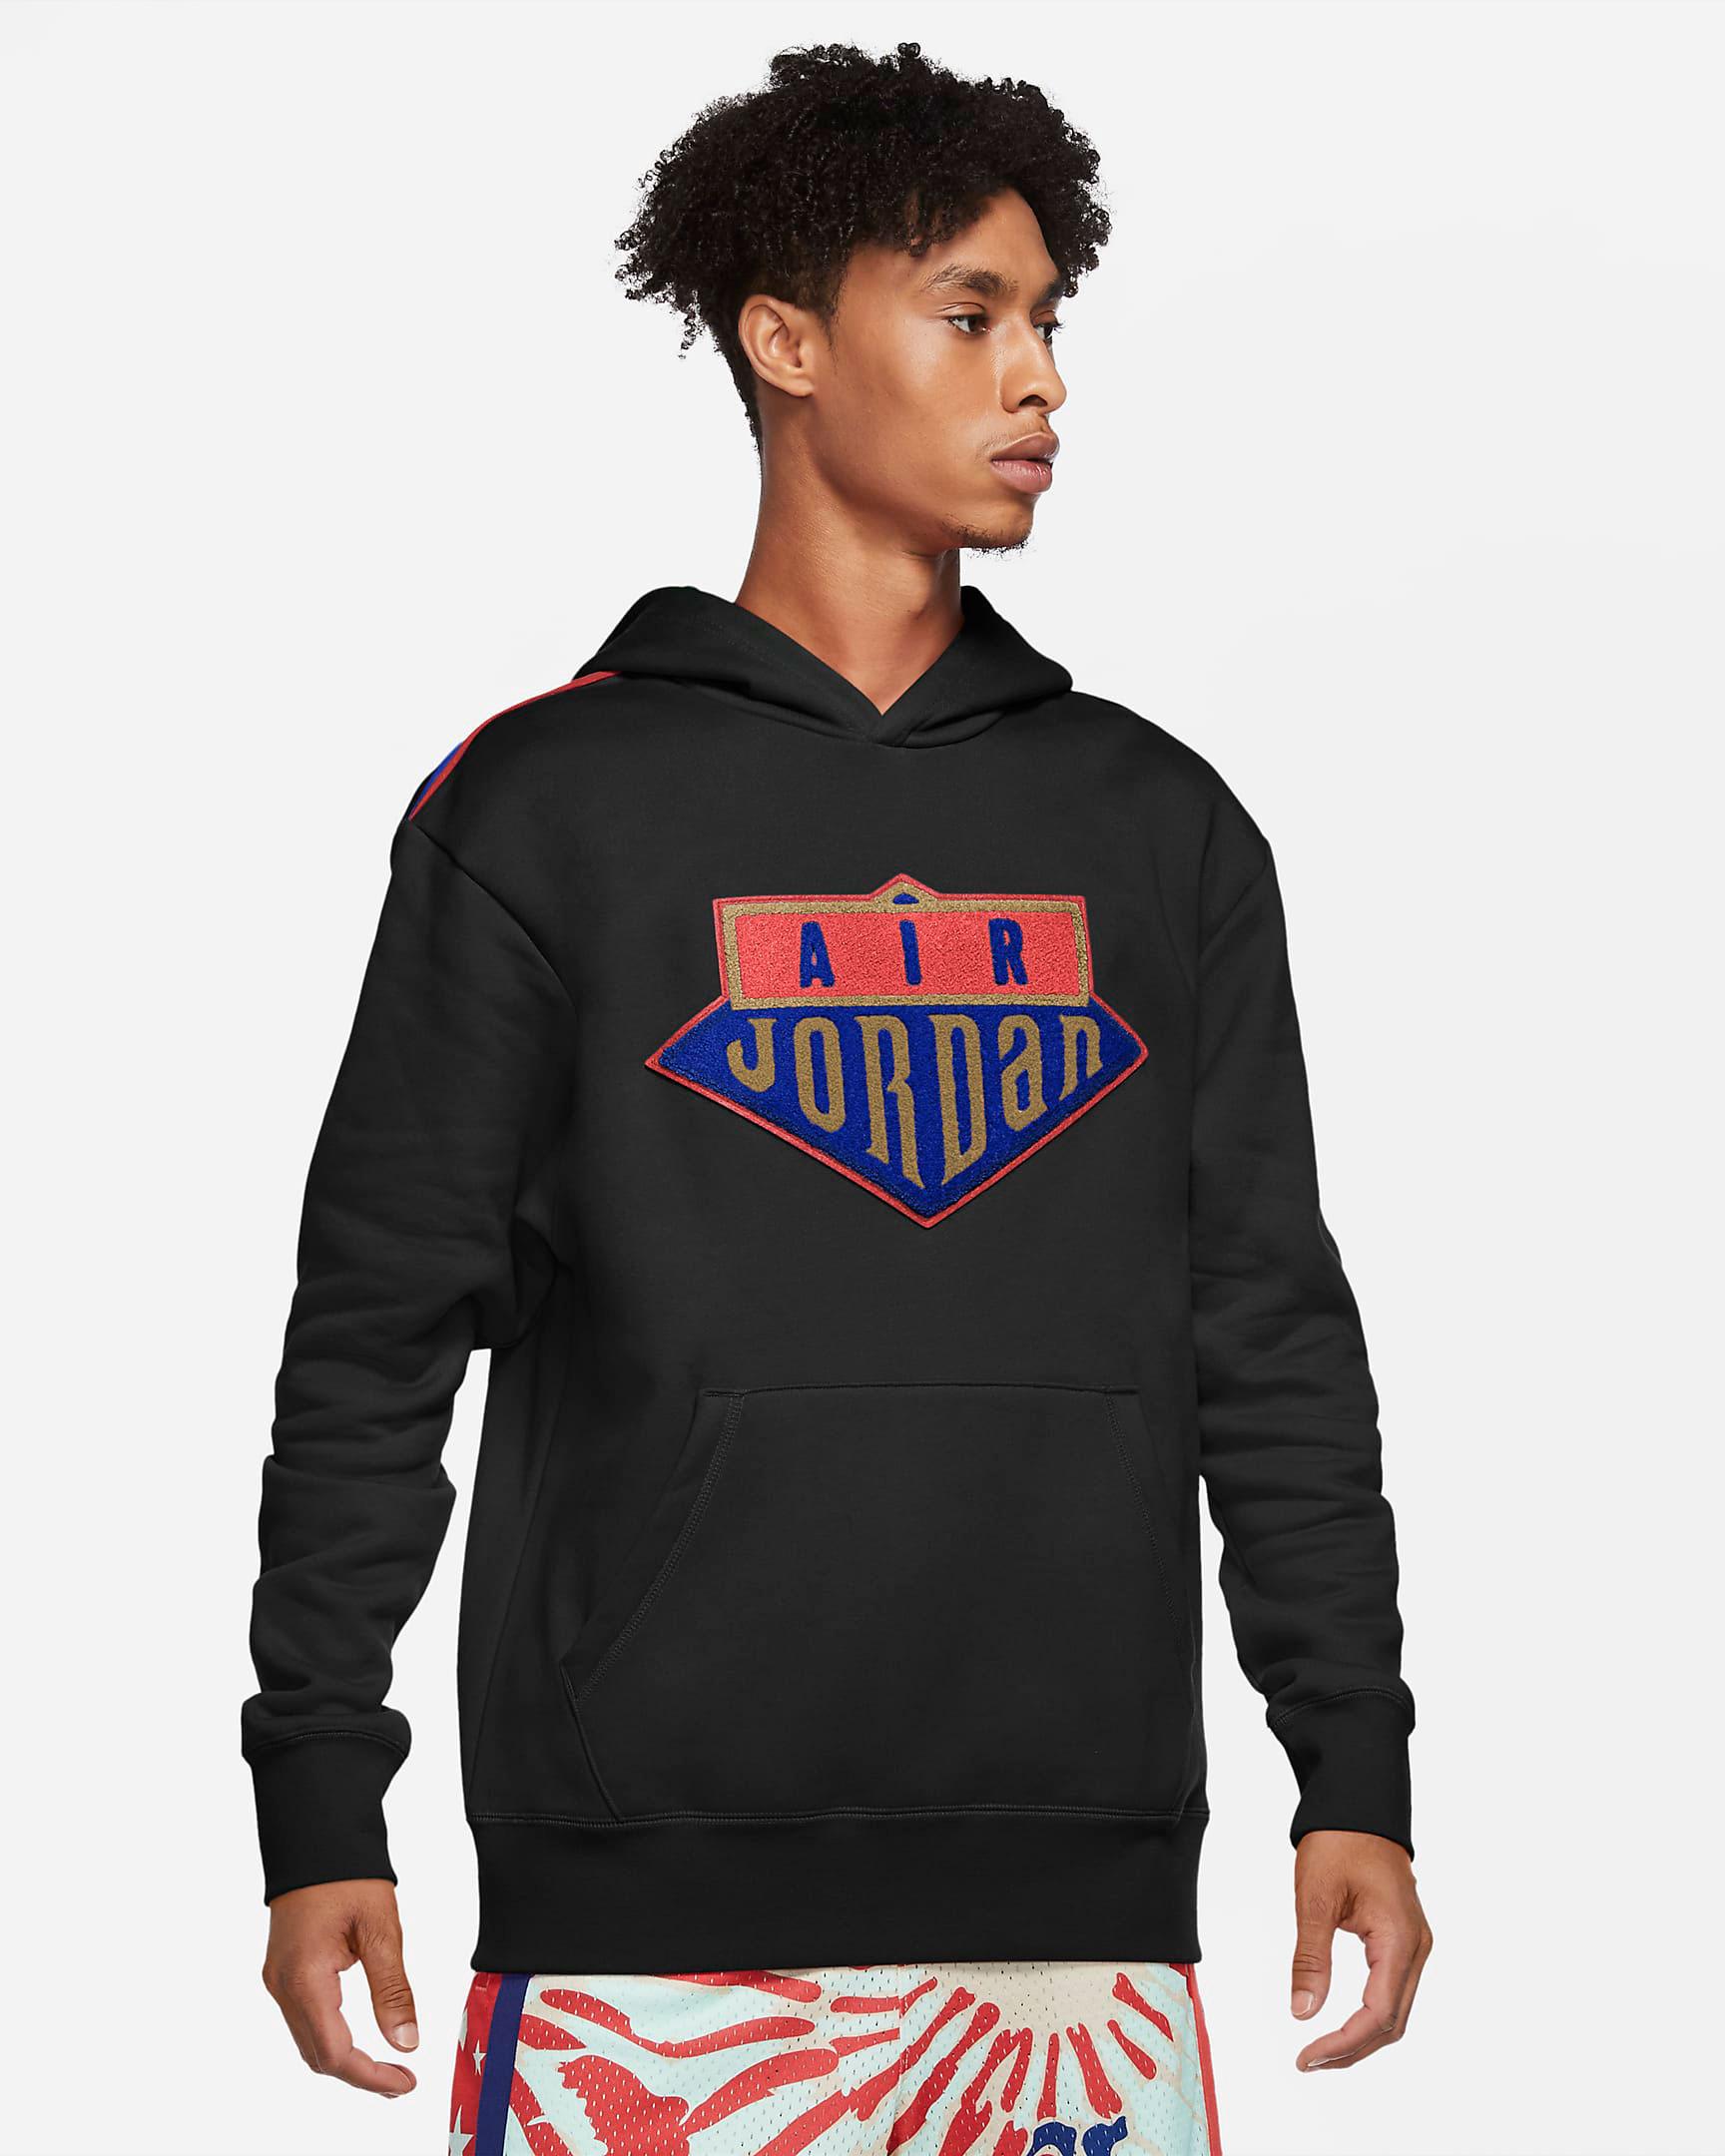 hoodie-to-match-jordan-14-hyper-royal-1